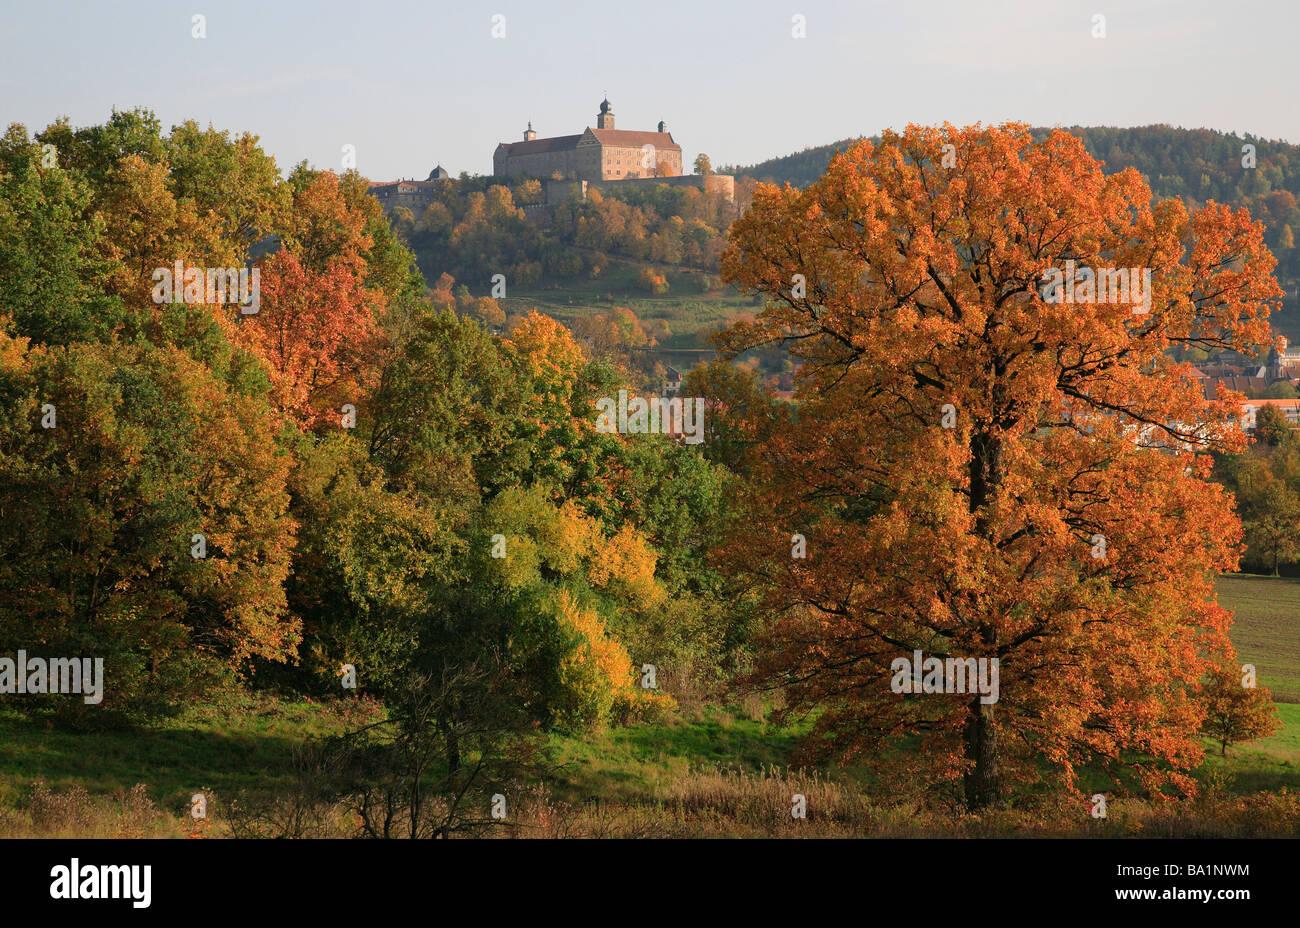 Castle Plassenburg at Kulmbach Upper Frankonia Bavaria Germany - Stock Image